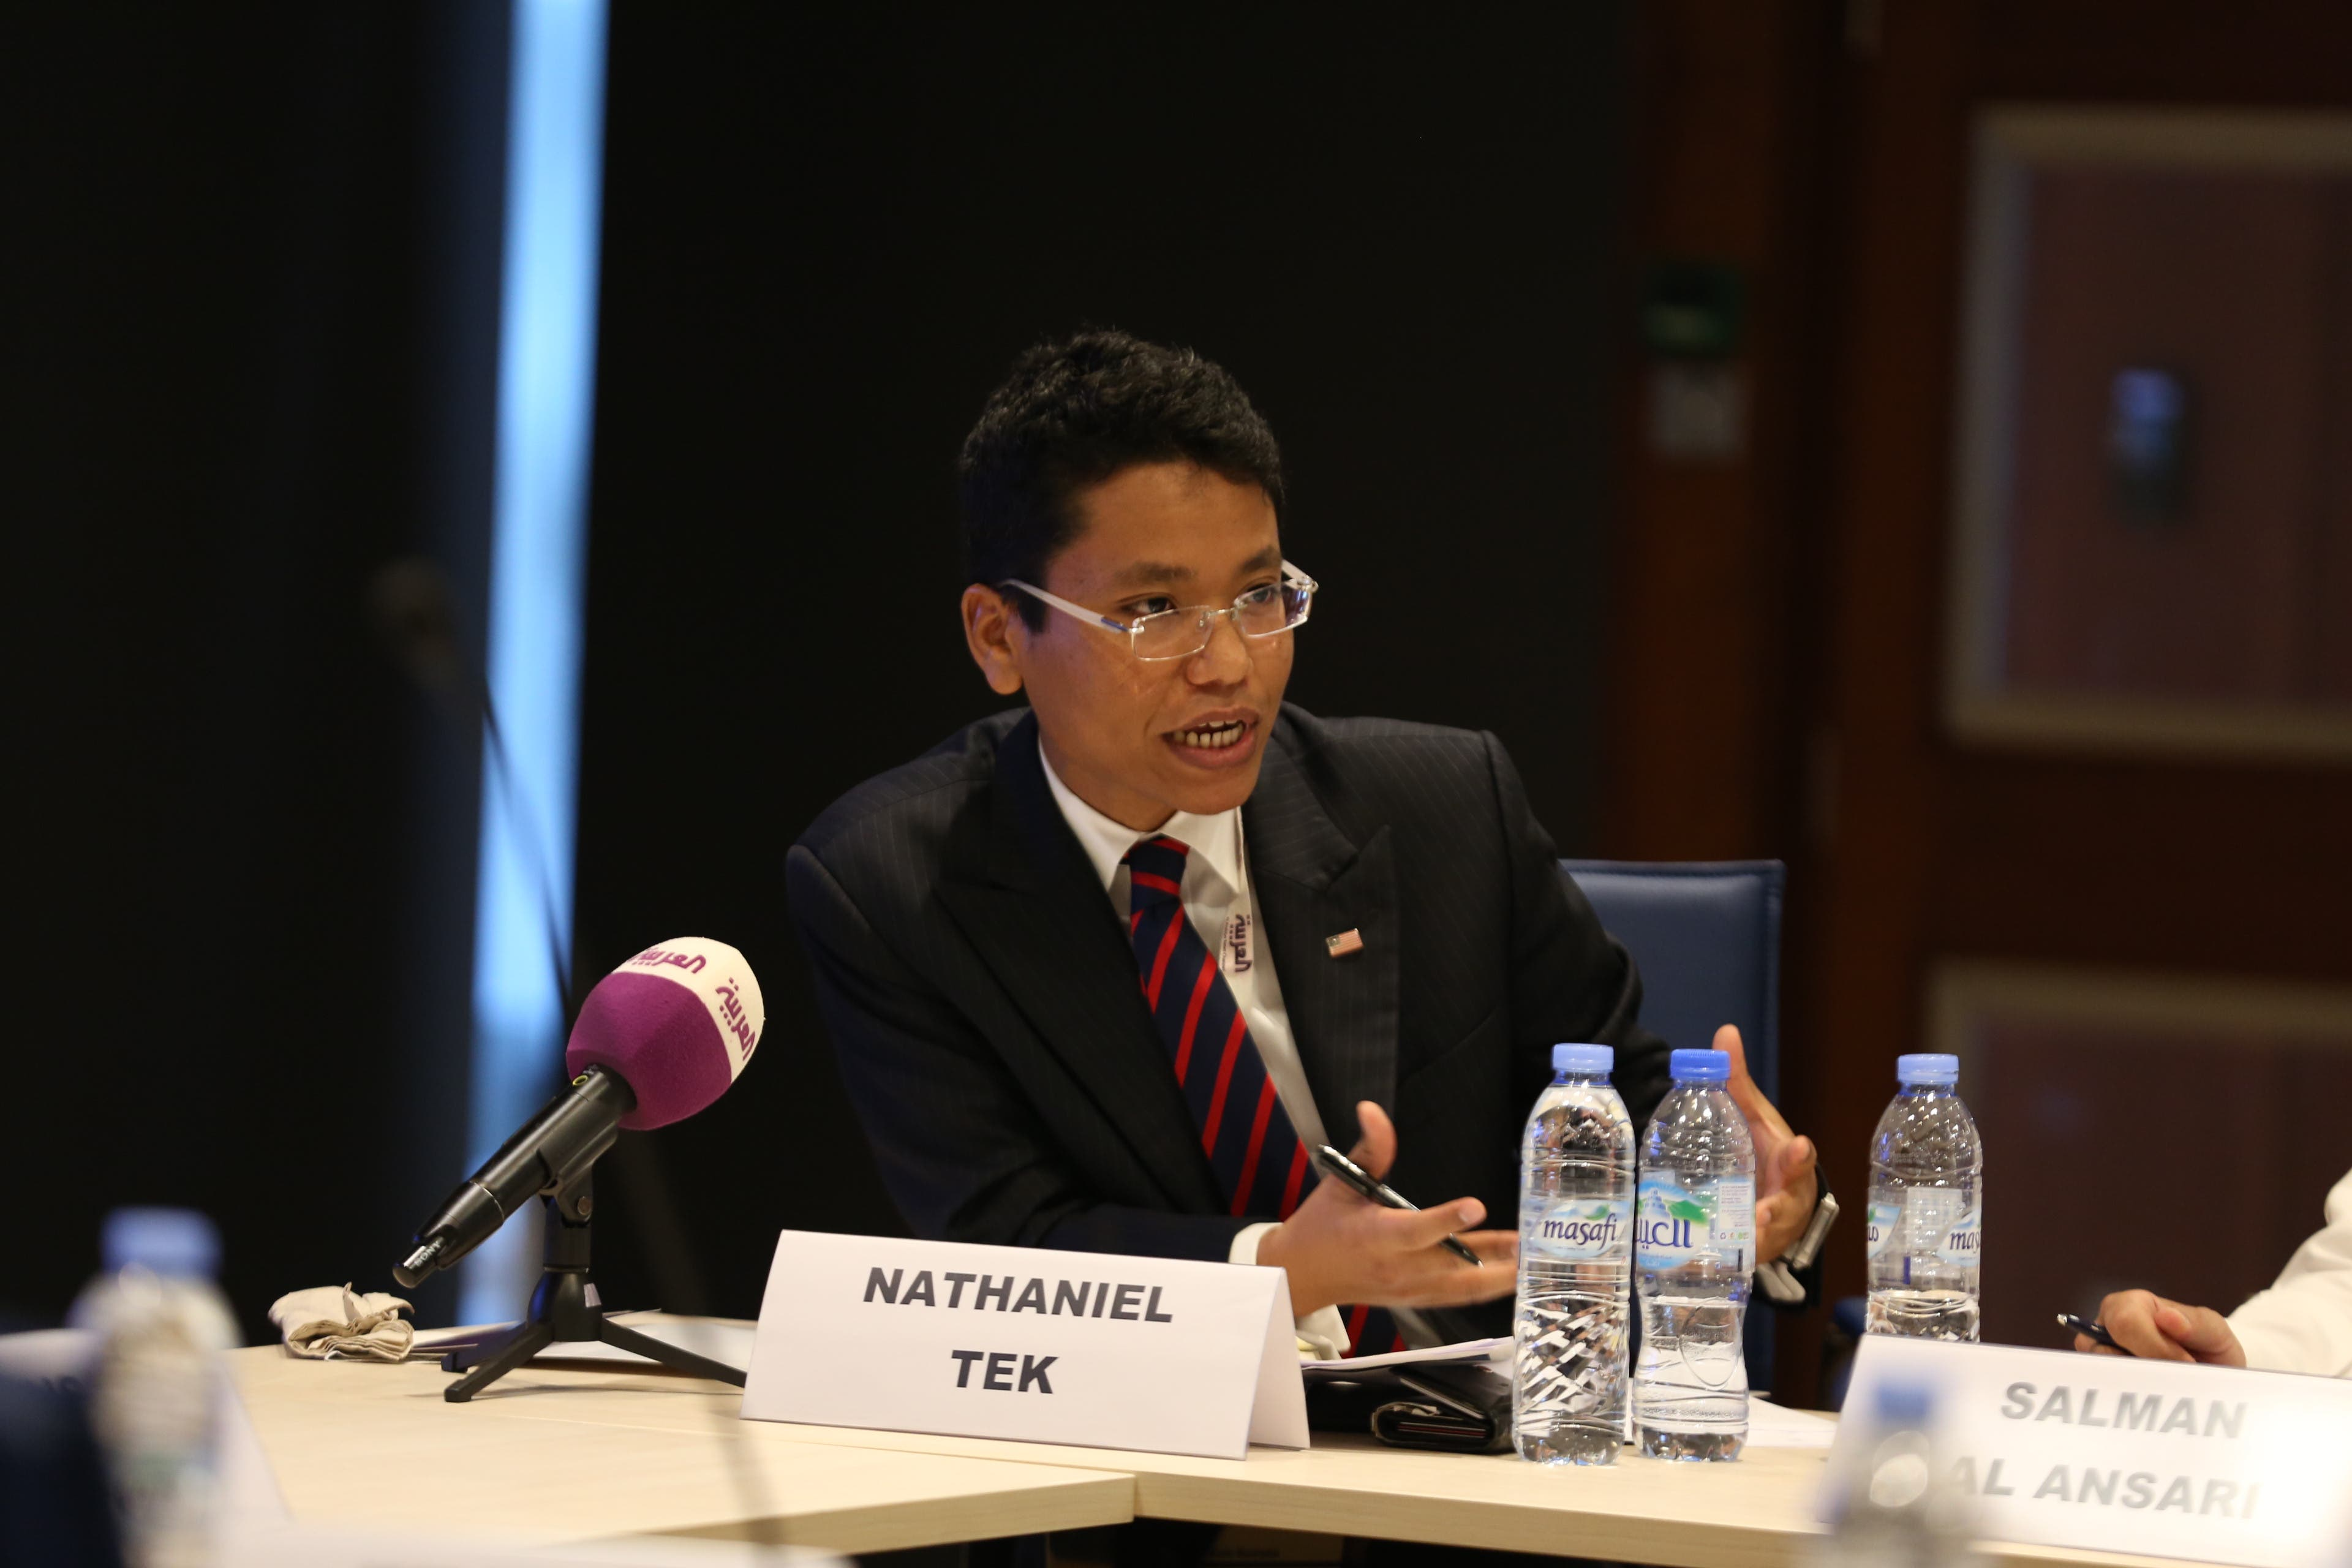 Nathaniel Tek, Regional Spokesperson – U.S. Government. (Al Arabiya News)